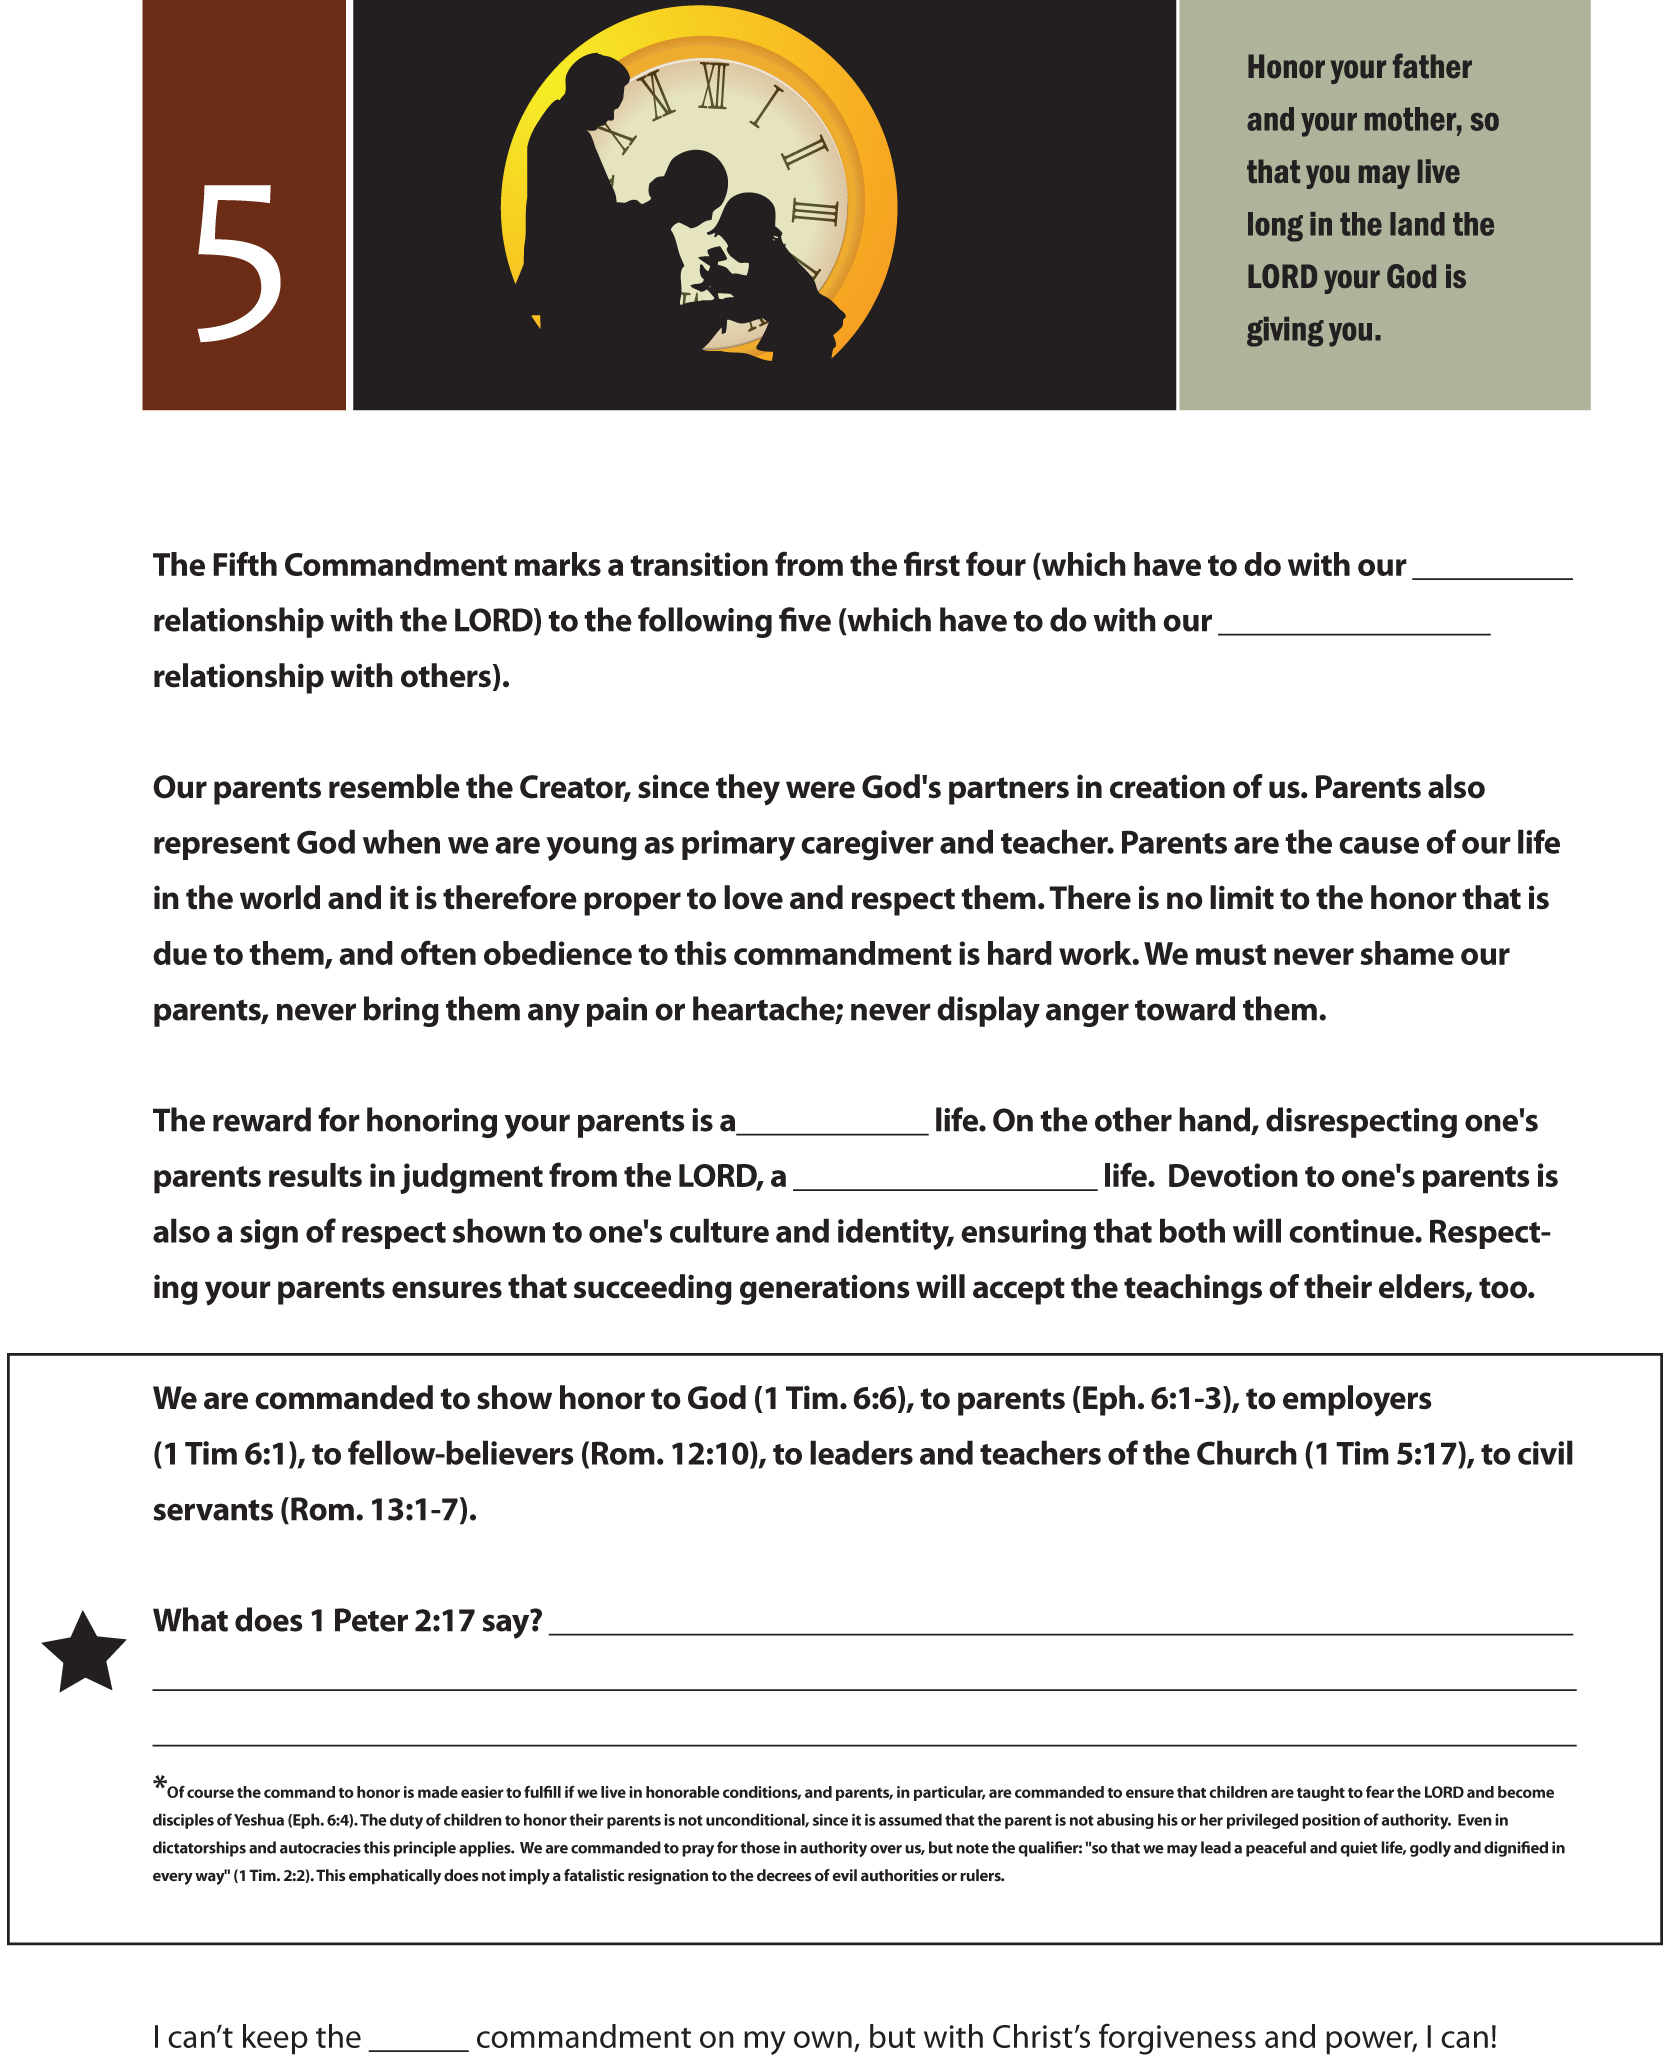 10 Commandments Graphics Worksheets Amp Curriculum For